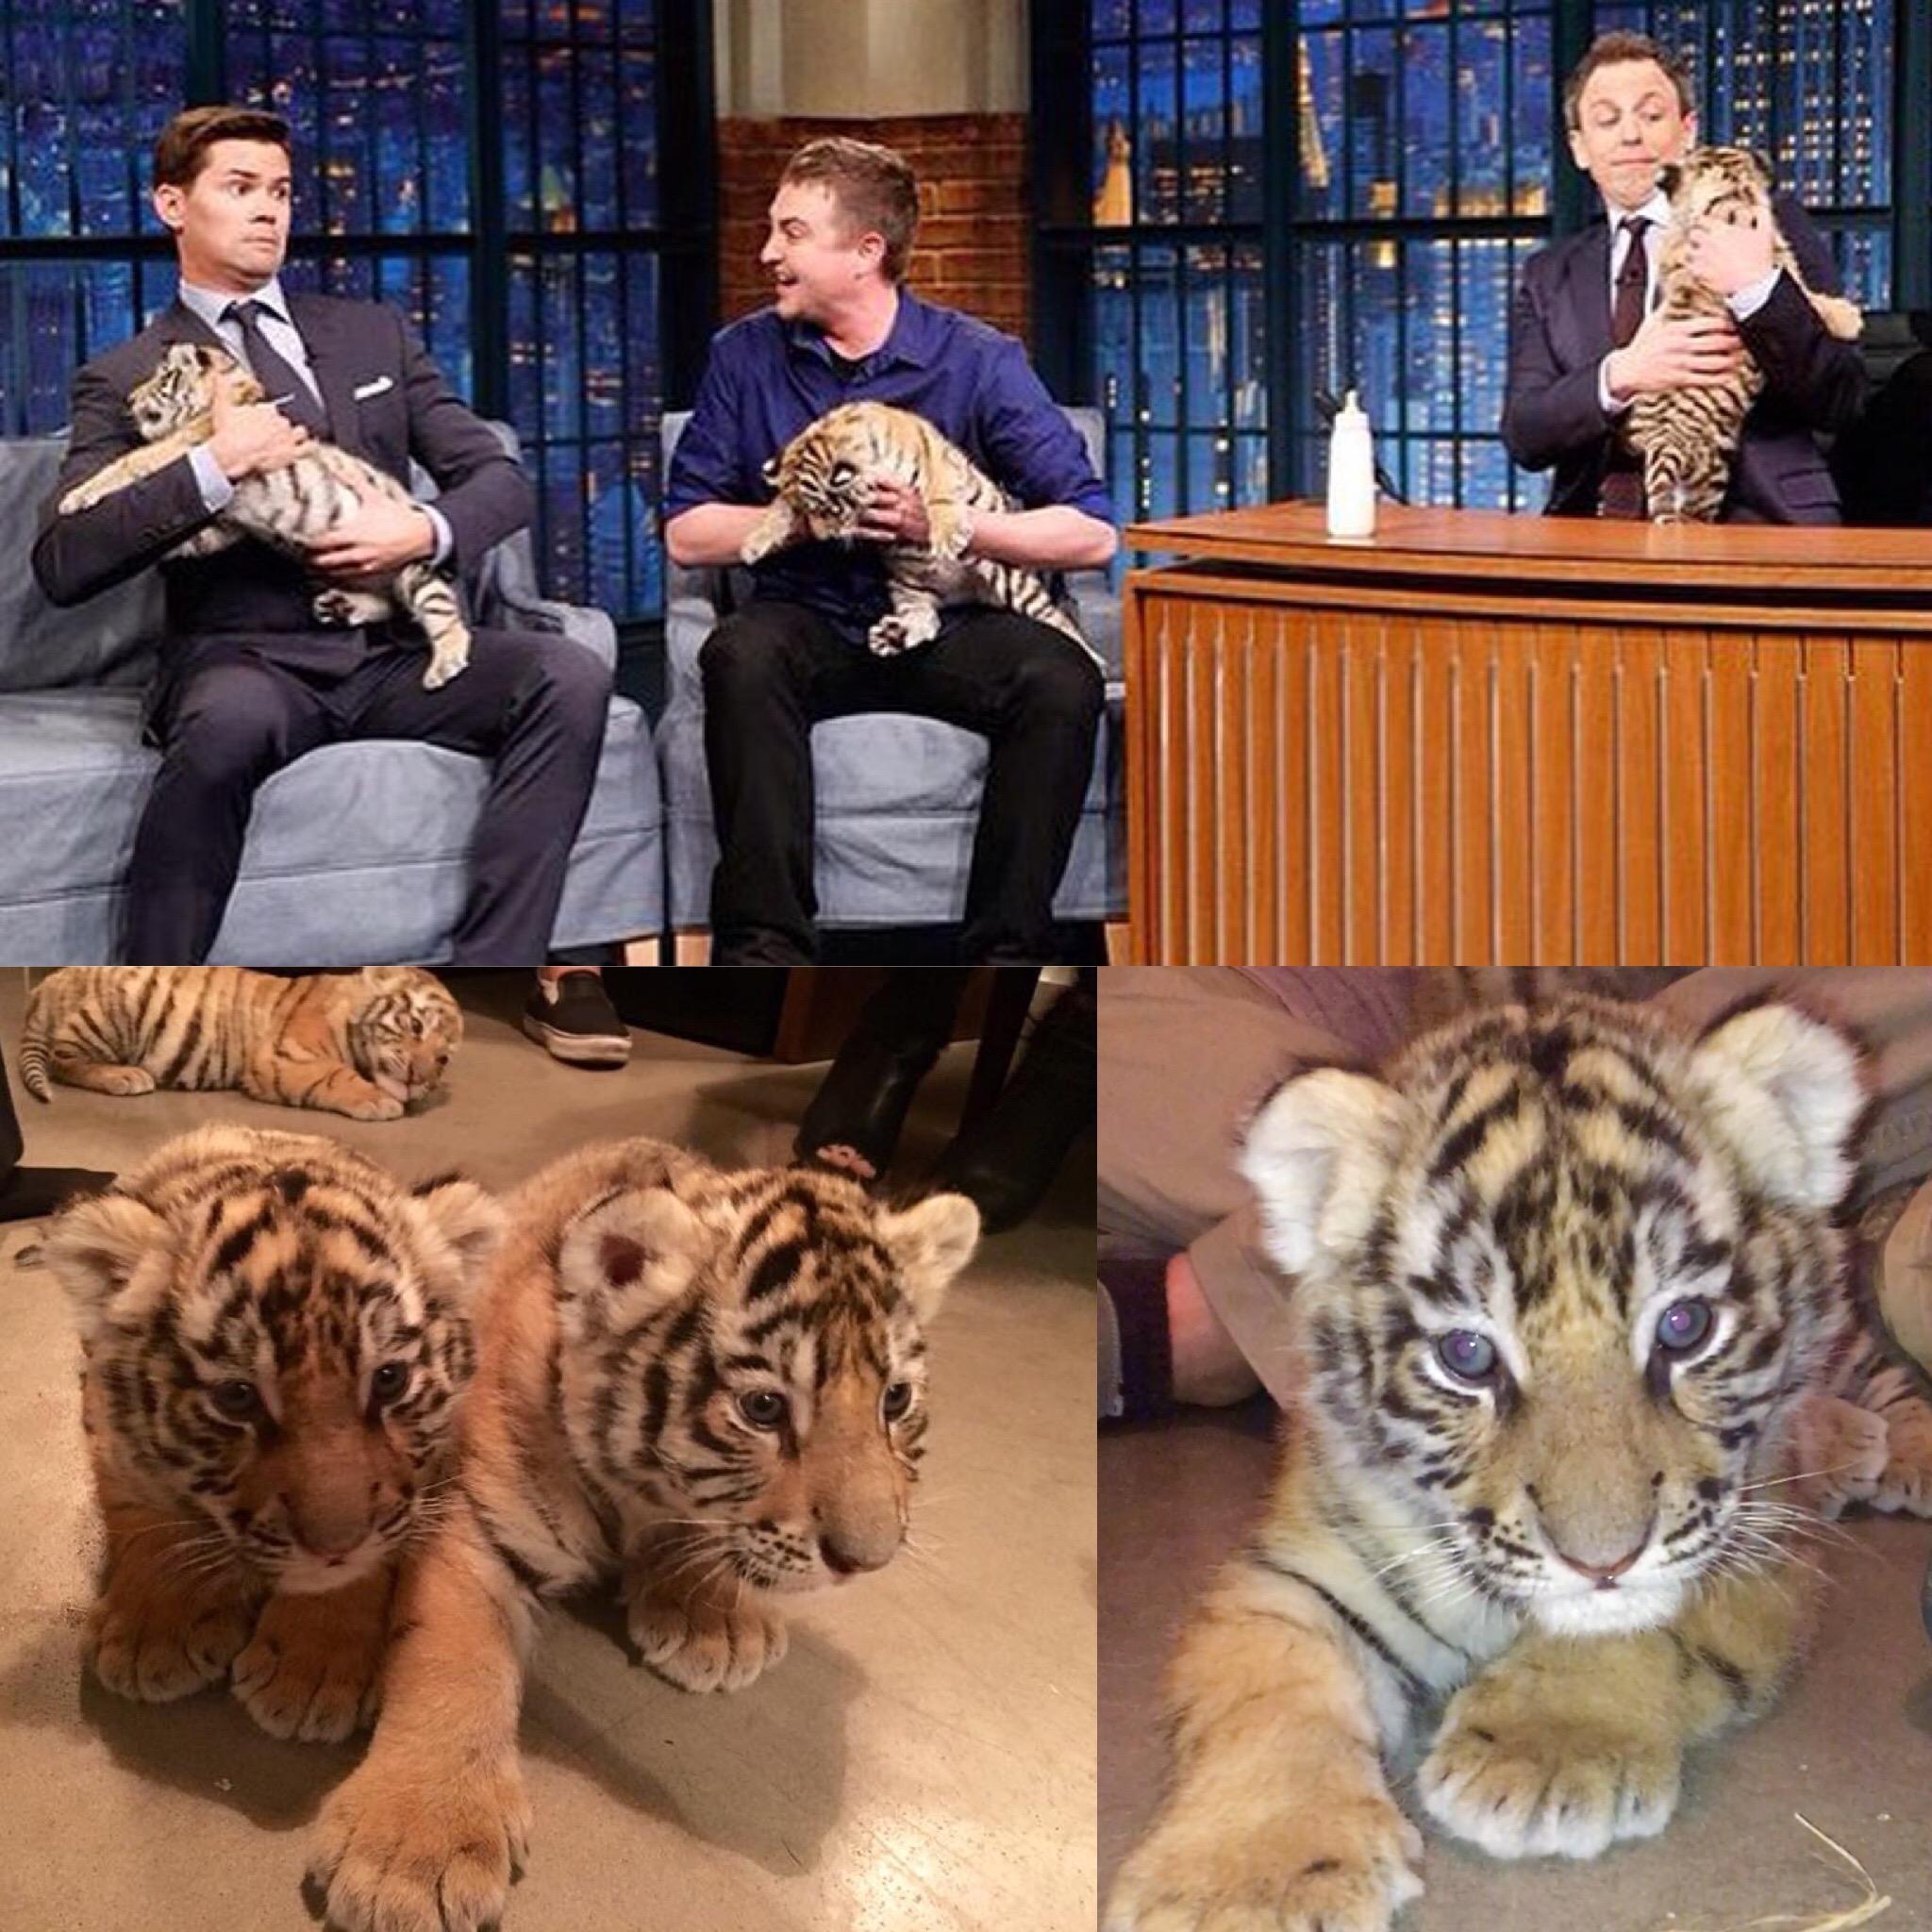 tiger-cubs-seth-meyers